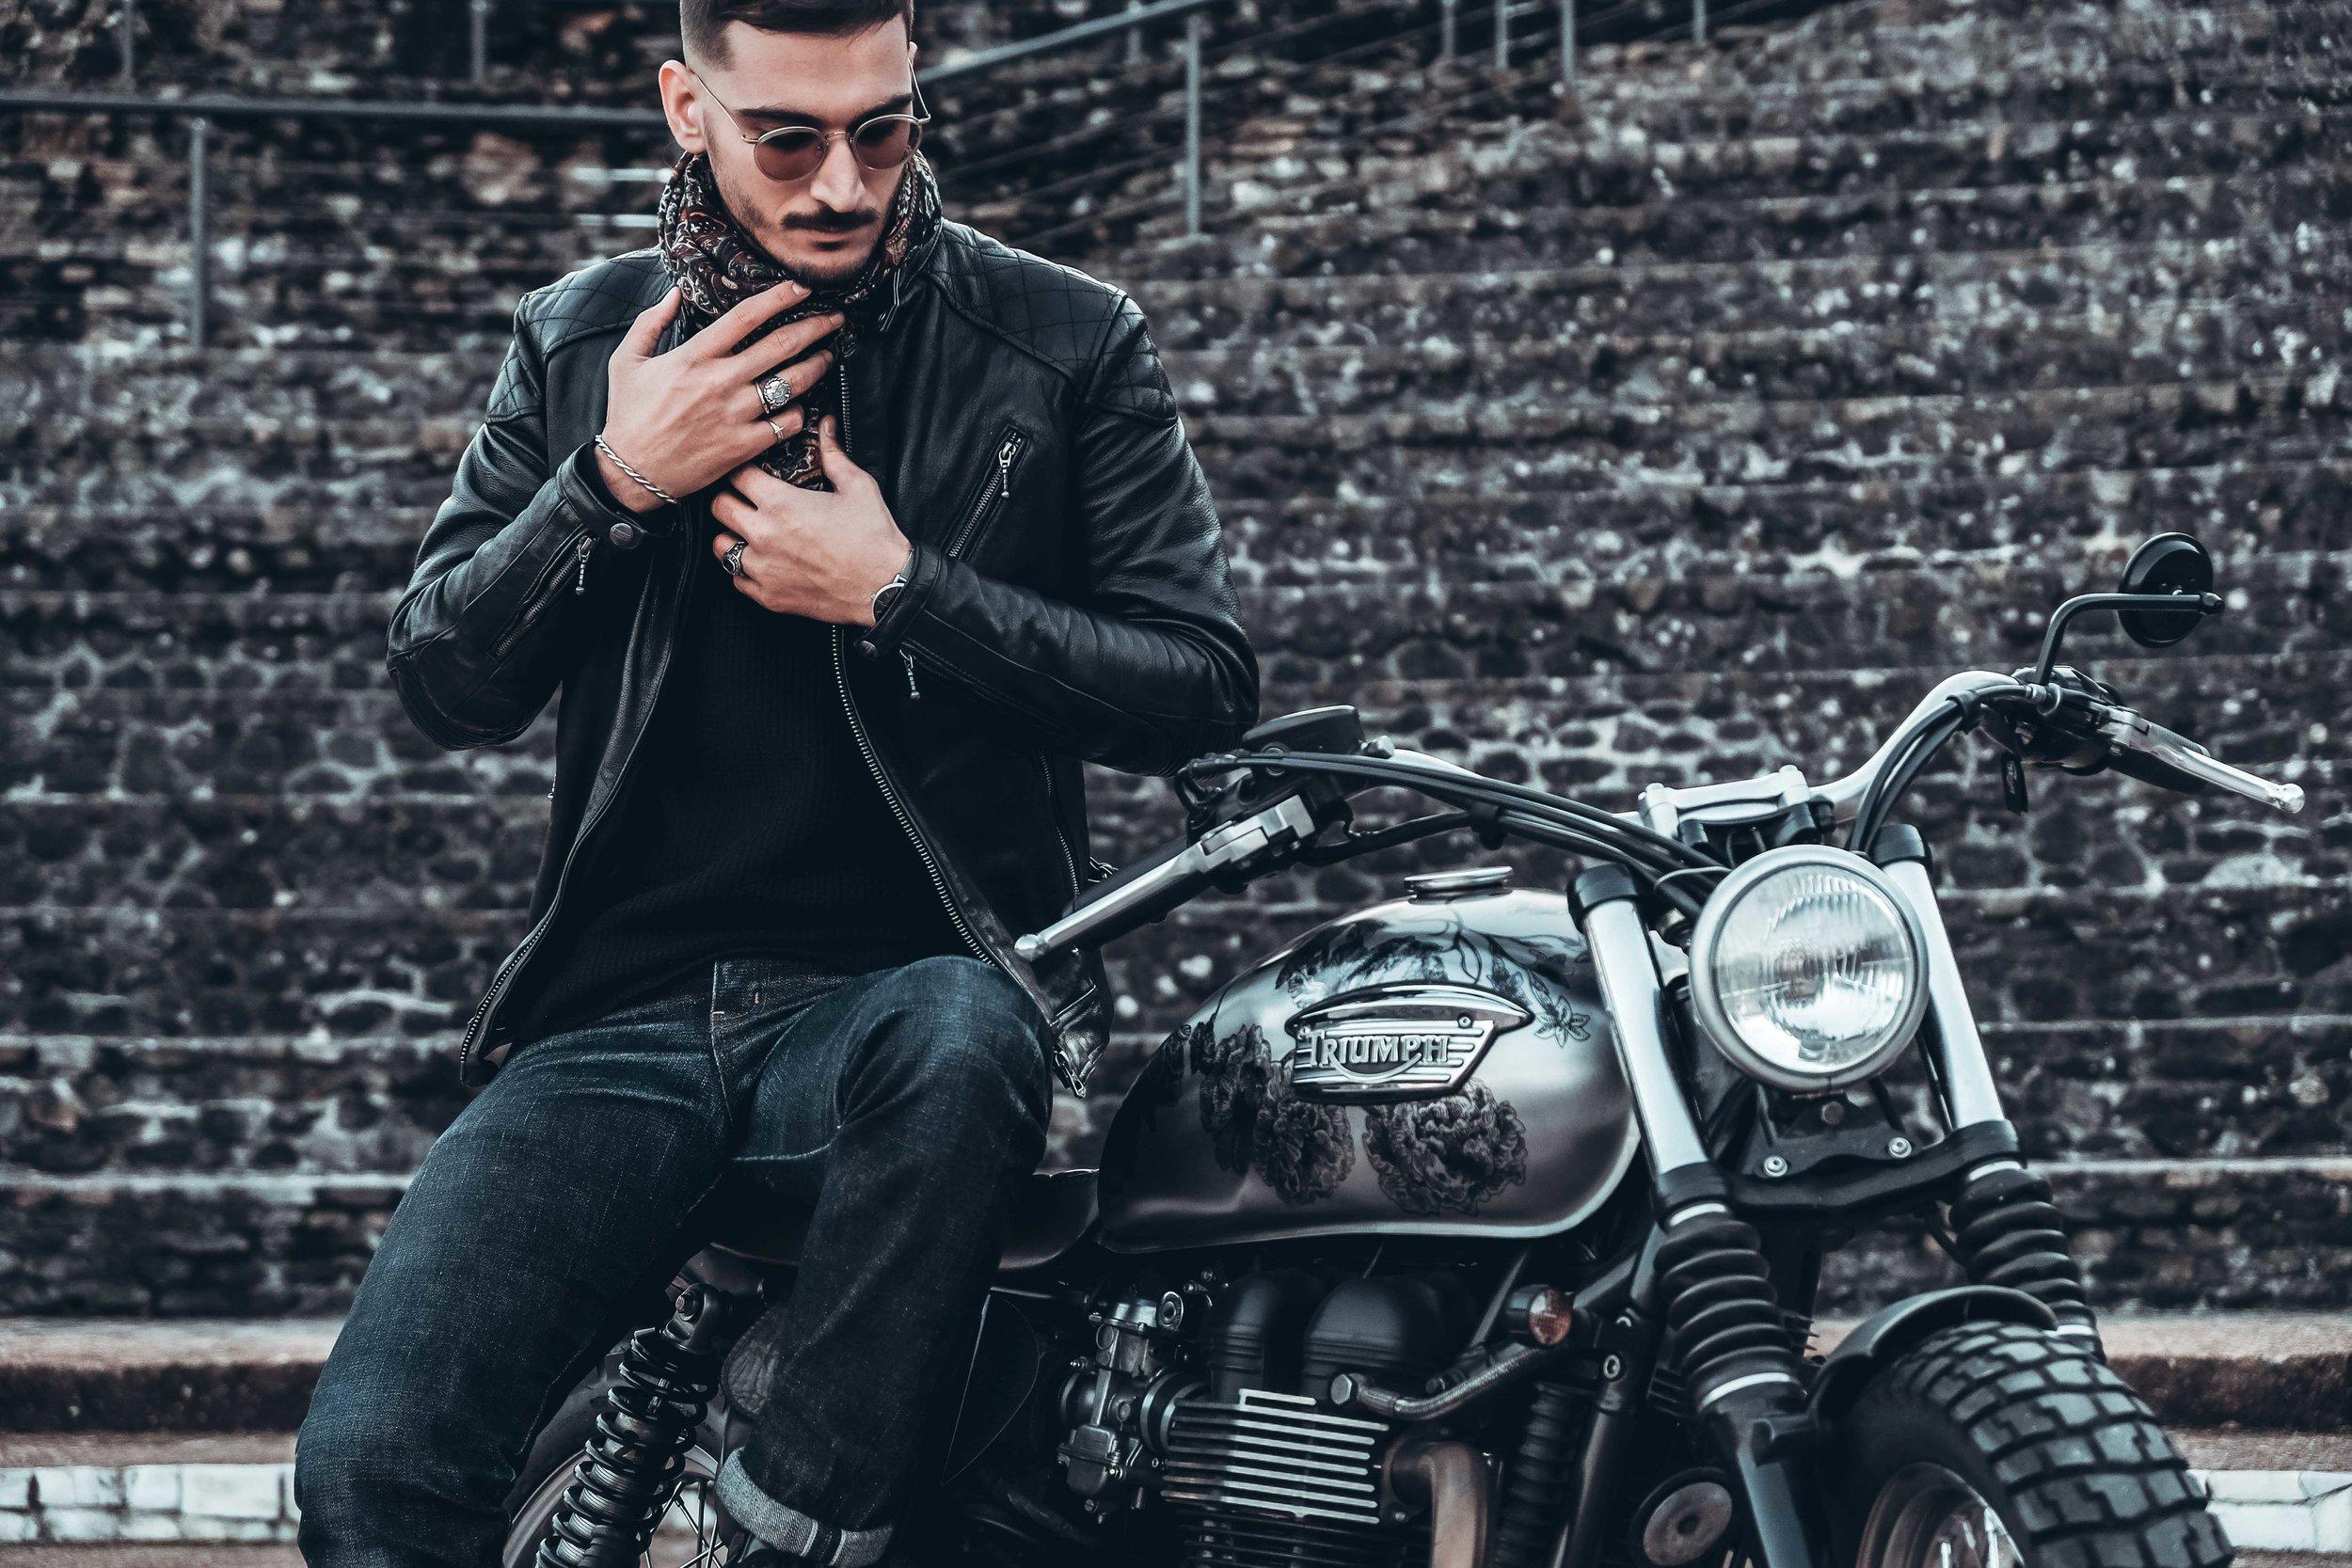 black-alchemy-x-moto-heroes-lifestyle-14.jpg